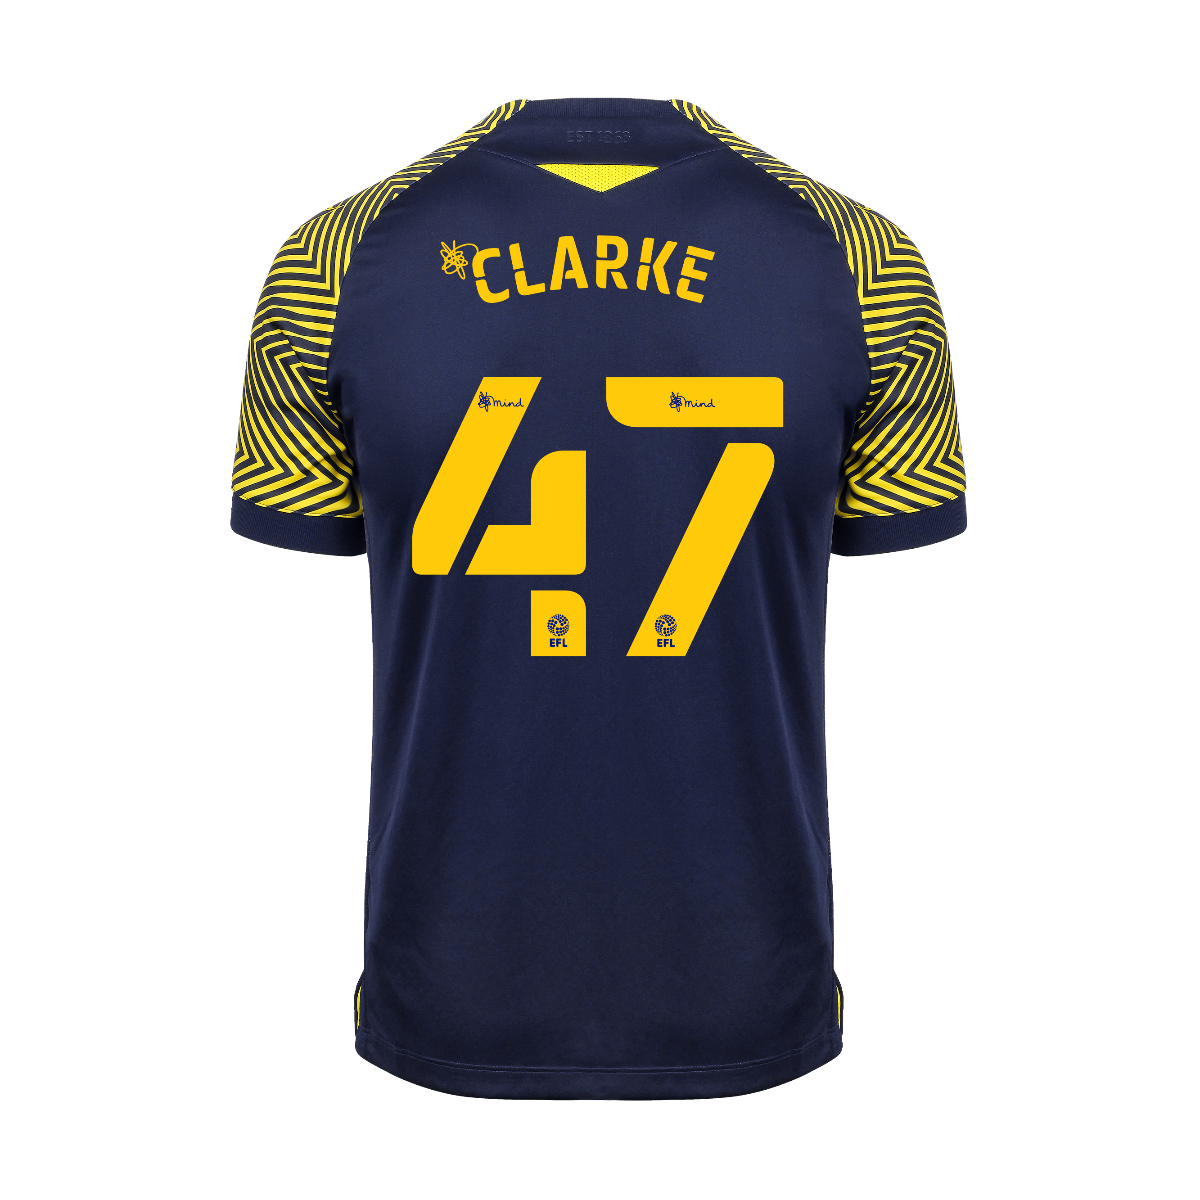 2020/21 Ladies Fit Away Shirt - Clarke